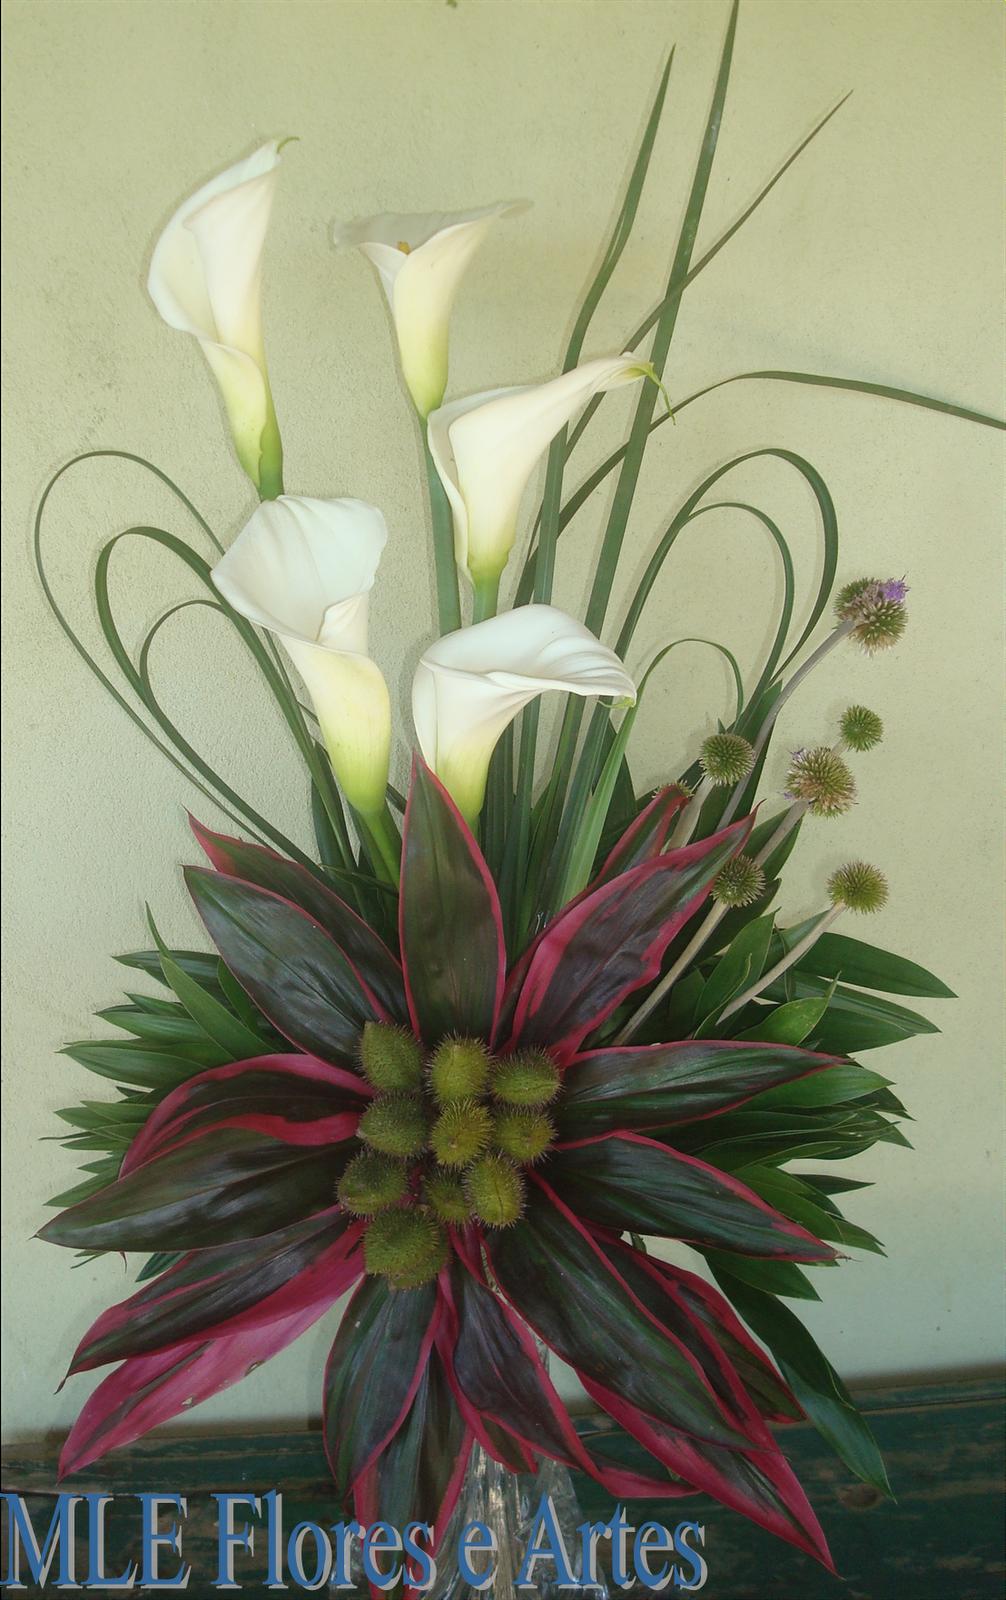 flores | Arreglos florales | Pinterest | Arreglos, Arreglos florales ...